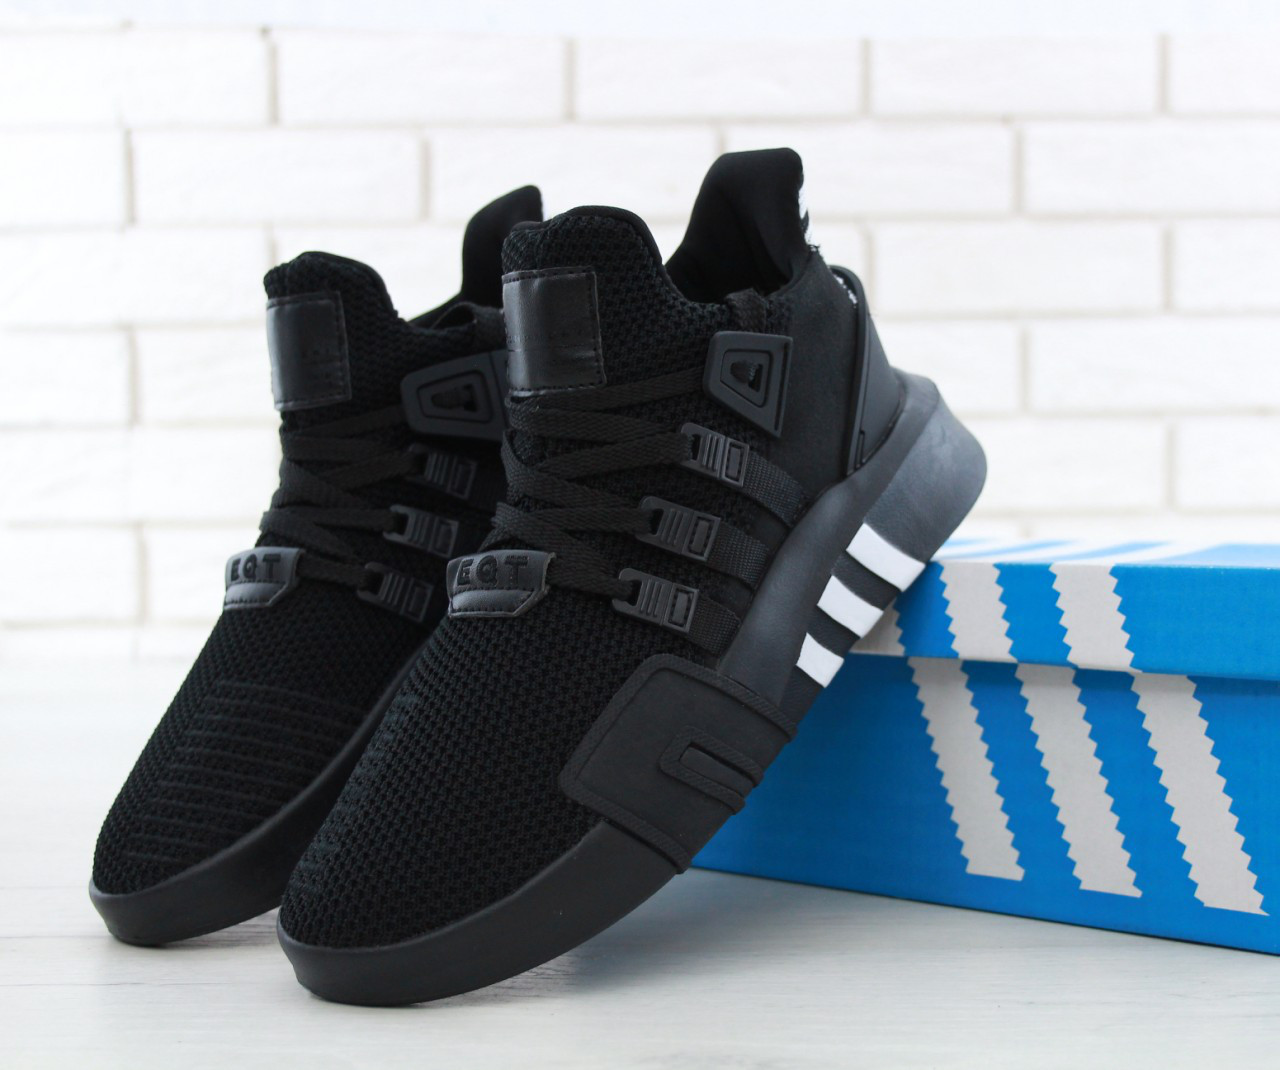 b9f0f9916 Мужские кроссовки Adidas EQT ADV Racing Black/White/Black/ адидас / реплика  -